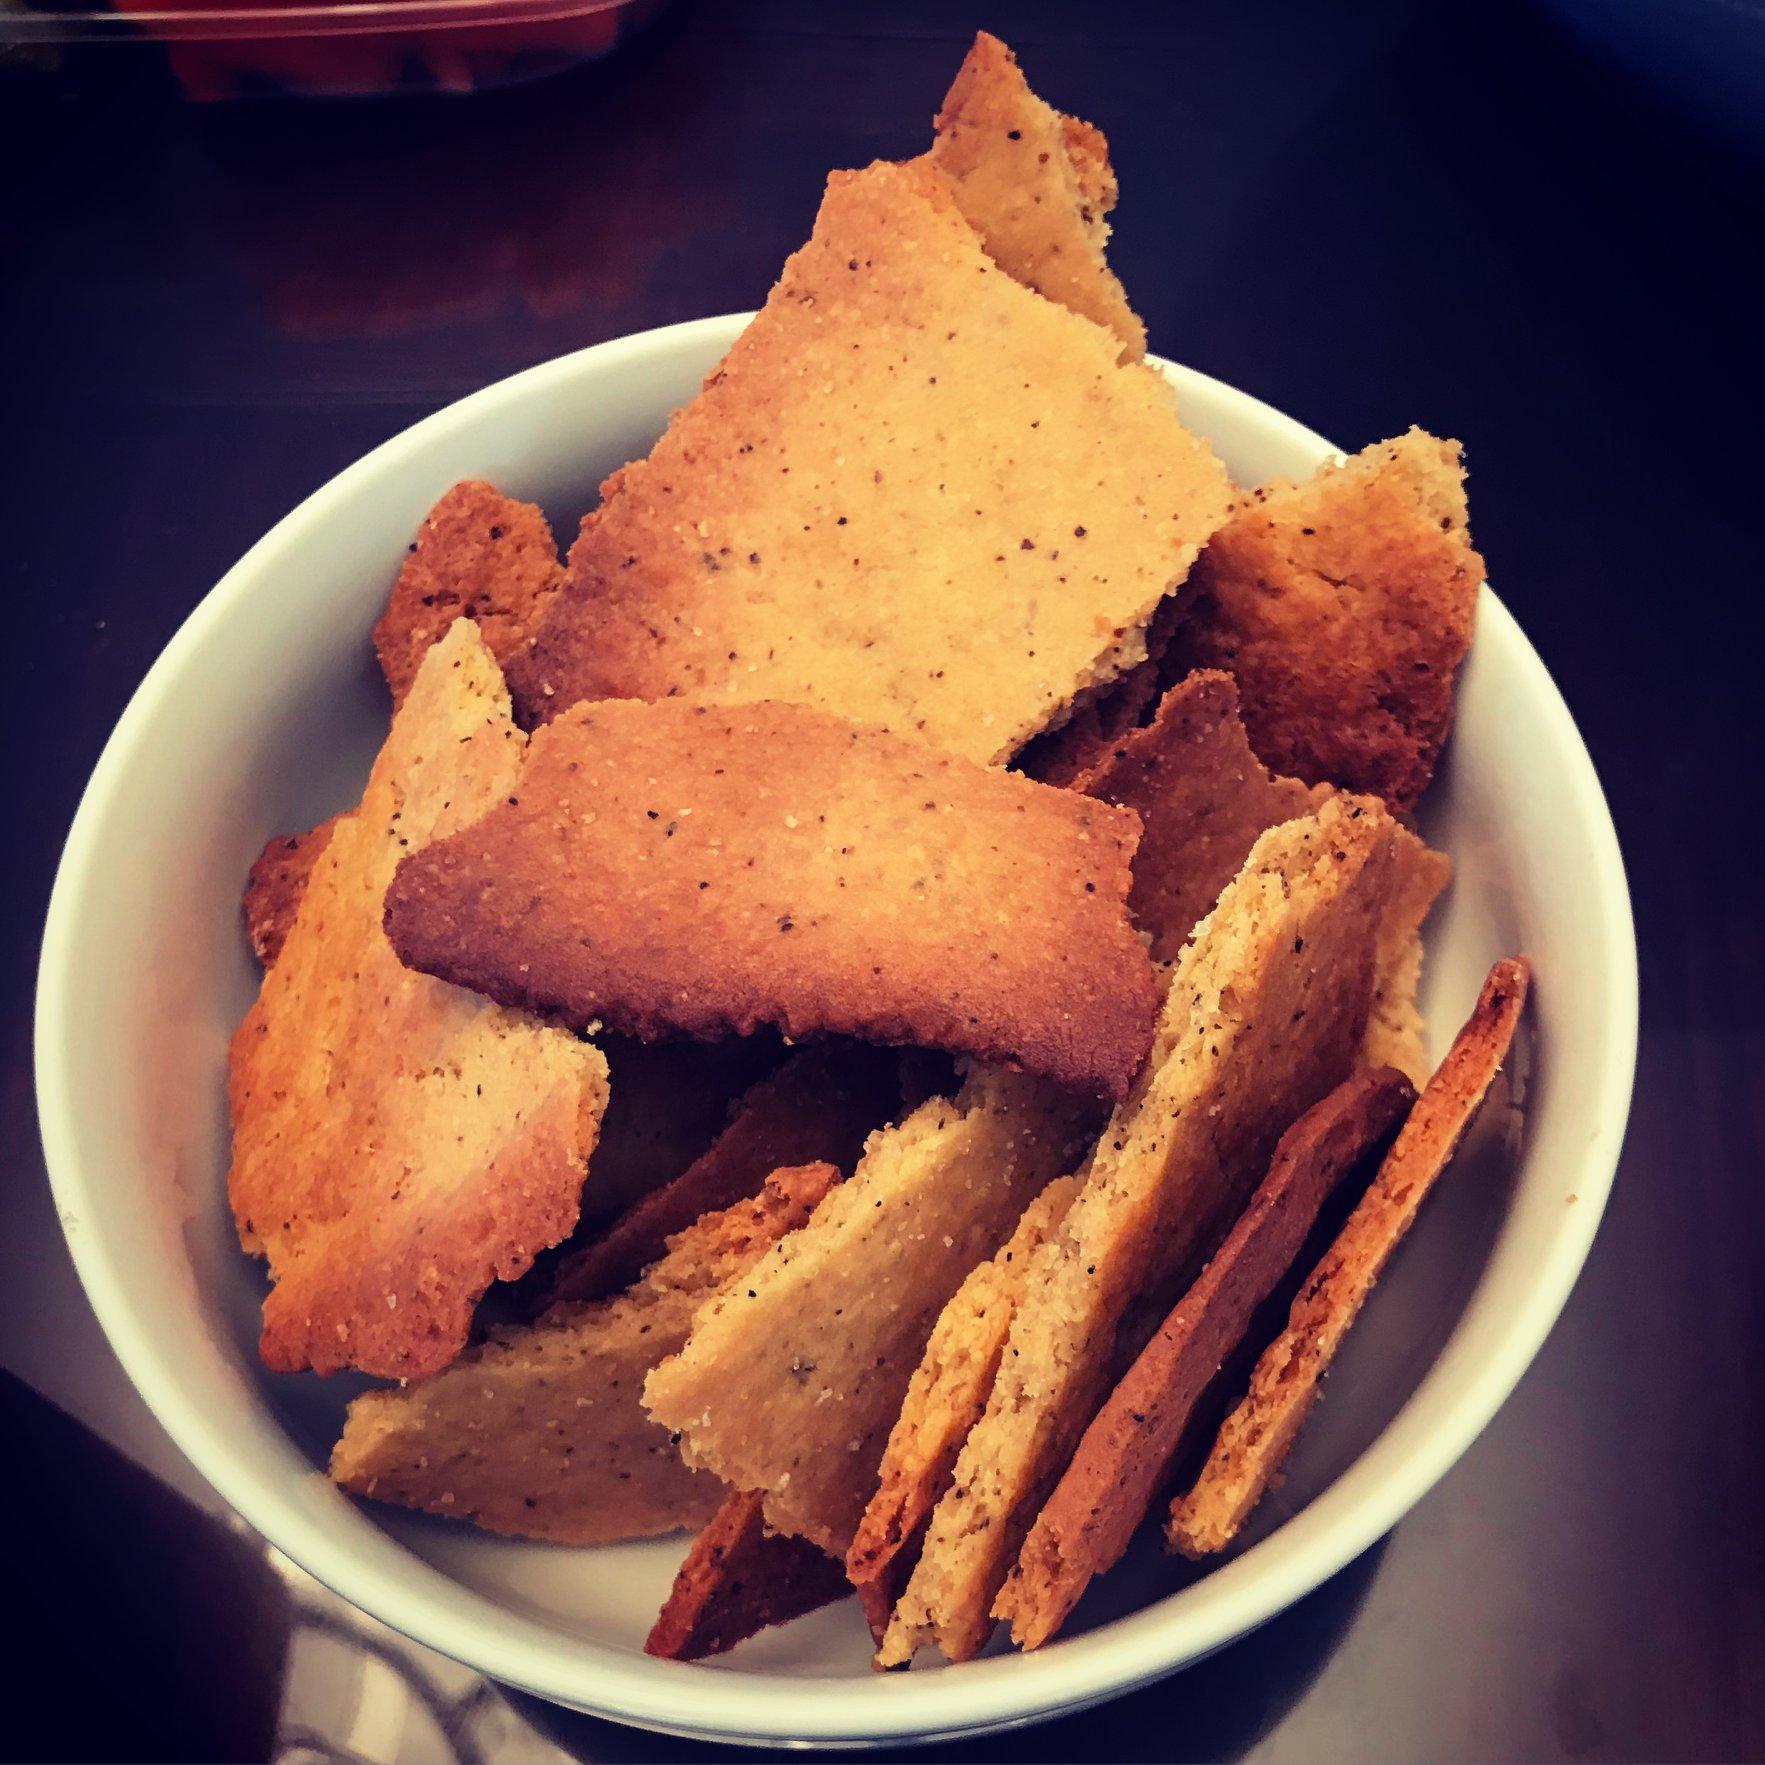 Cheddar-black pepper crackers